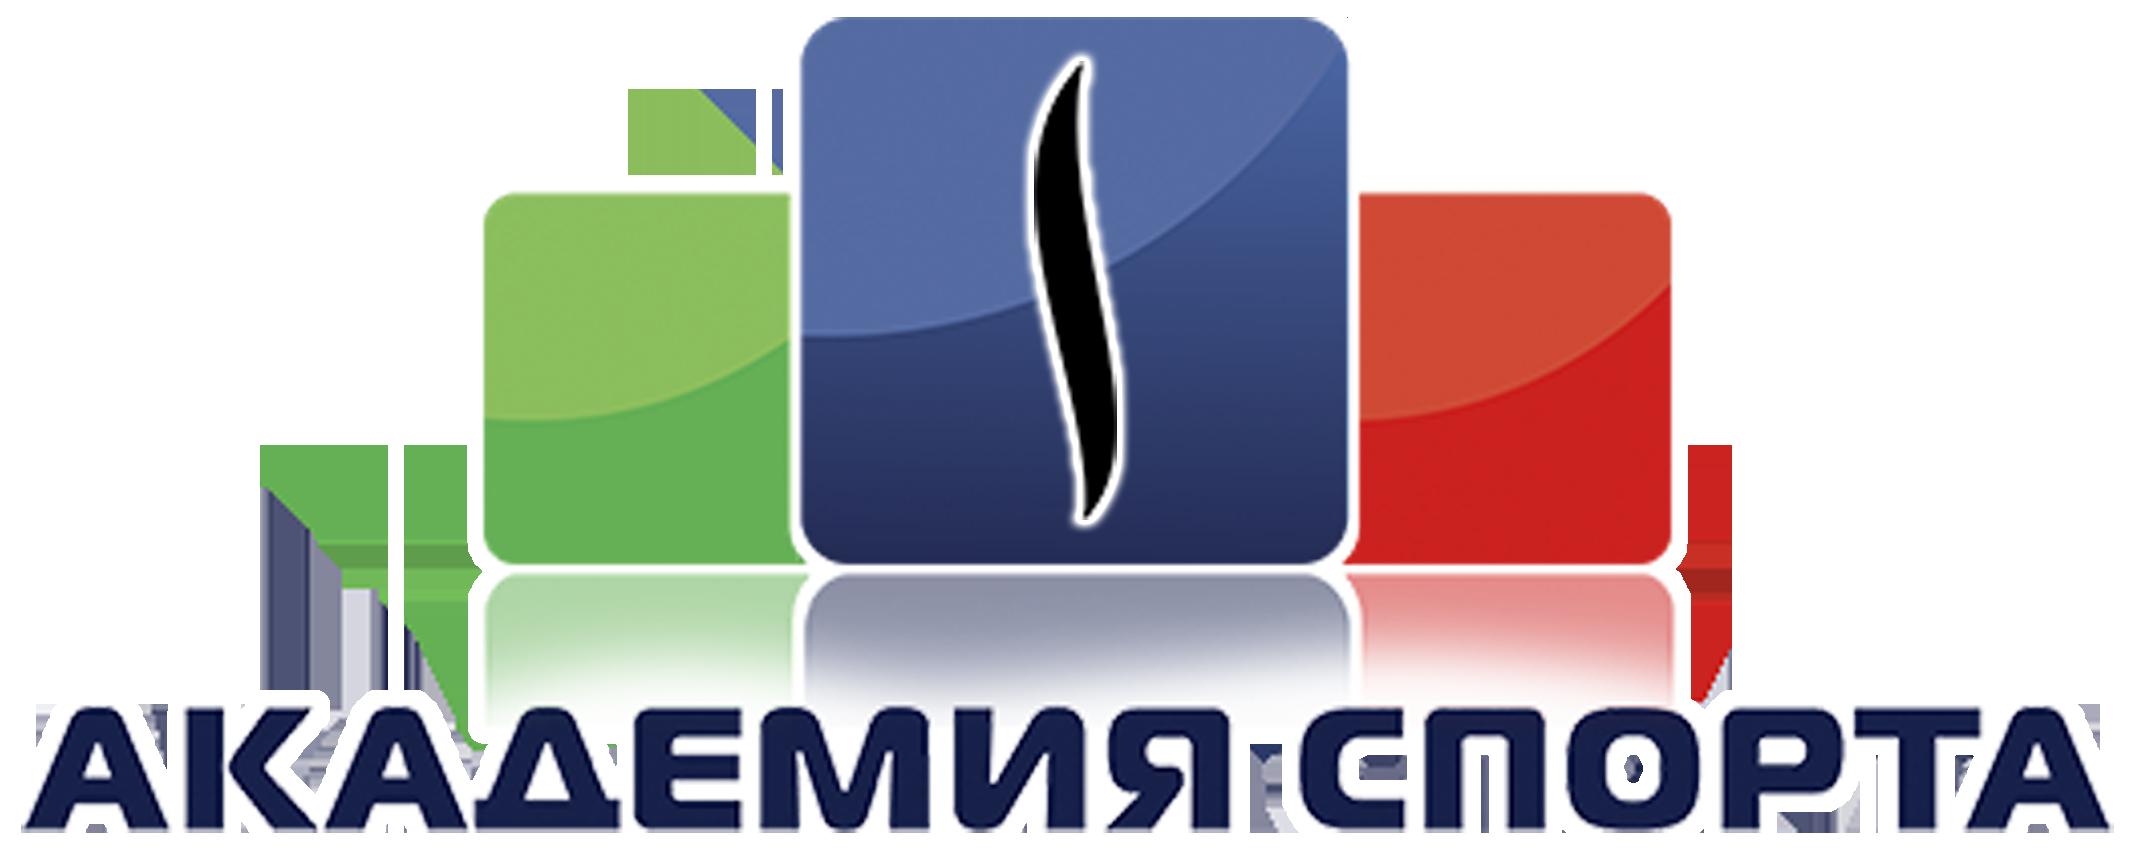 (c) Academy-sports.ru